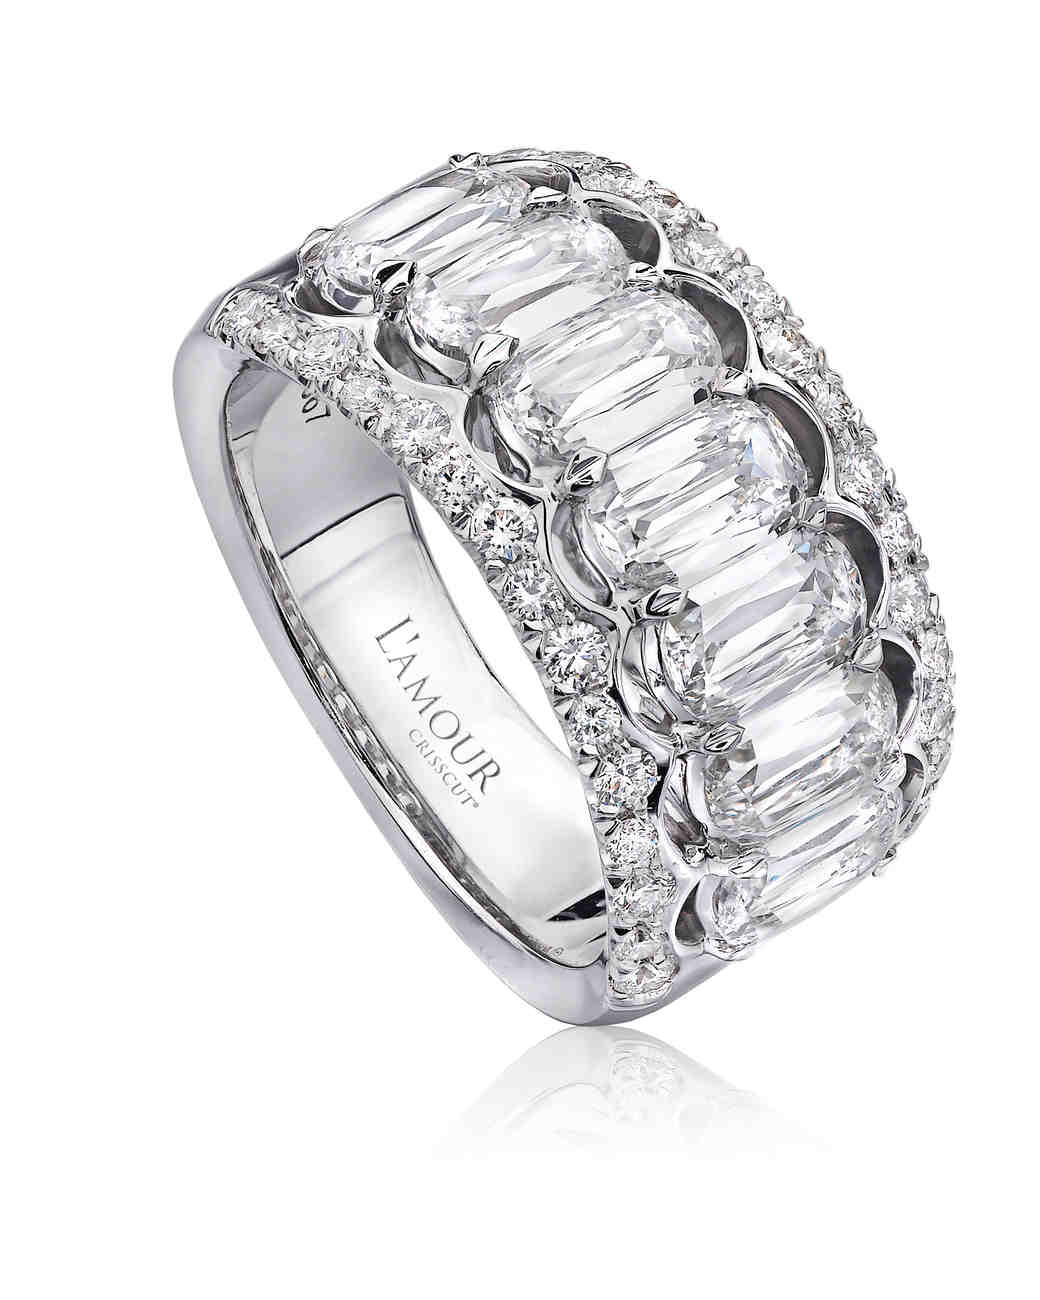 womens-wedding-bands-christopher-designs-0415.jpg